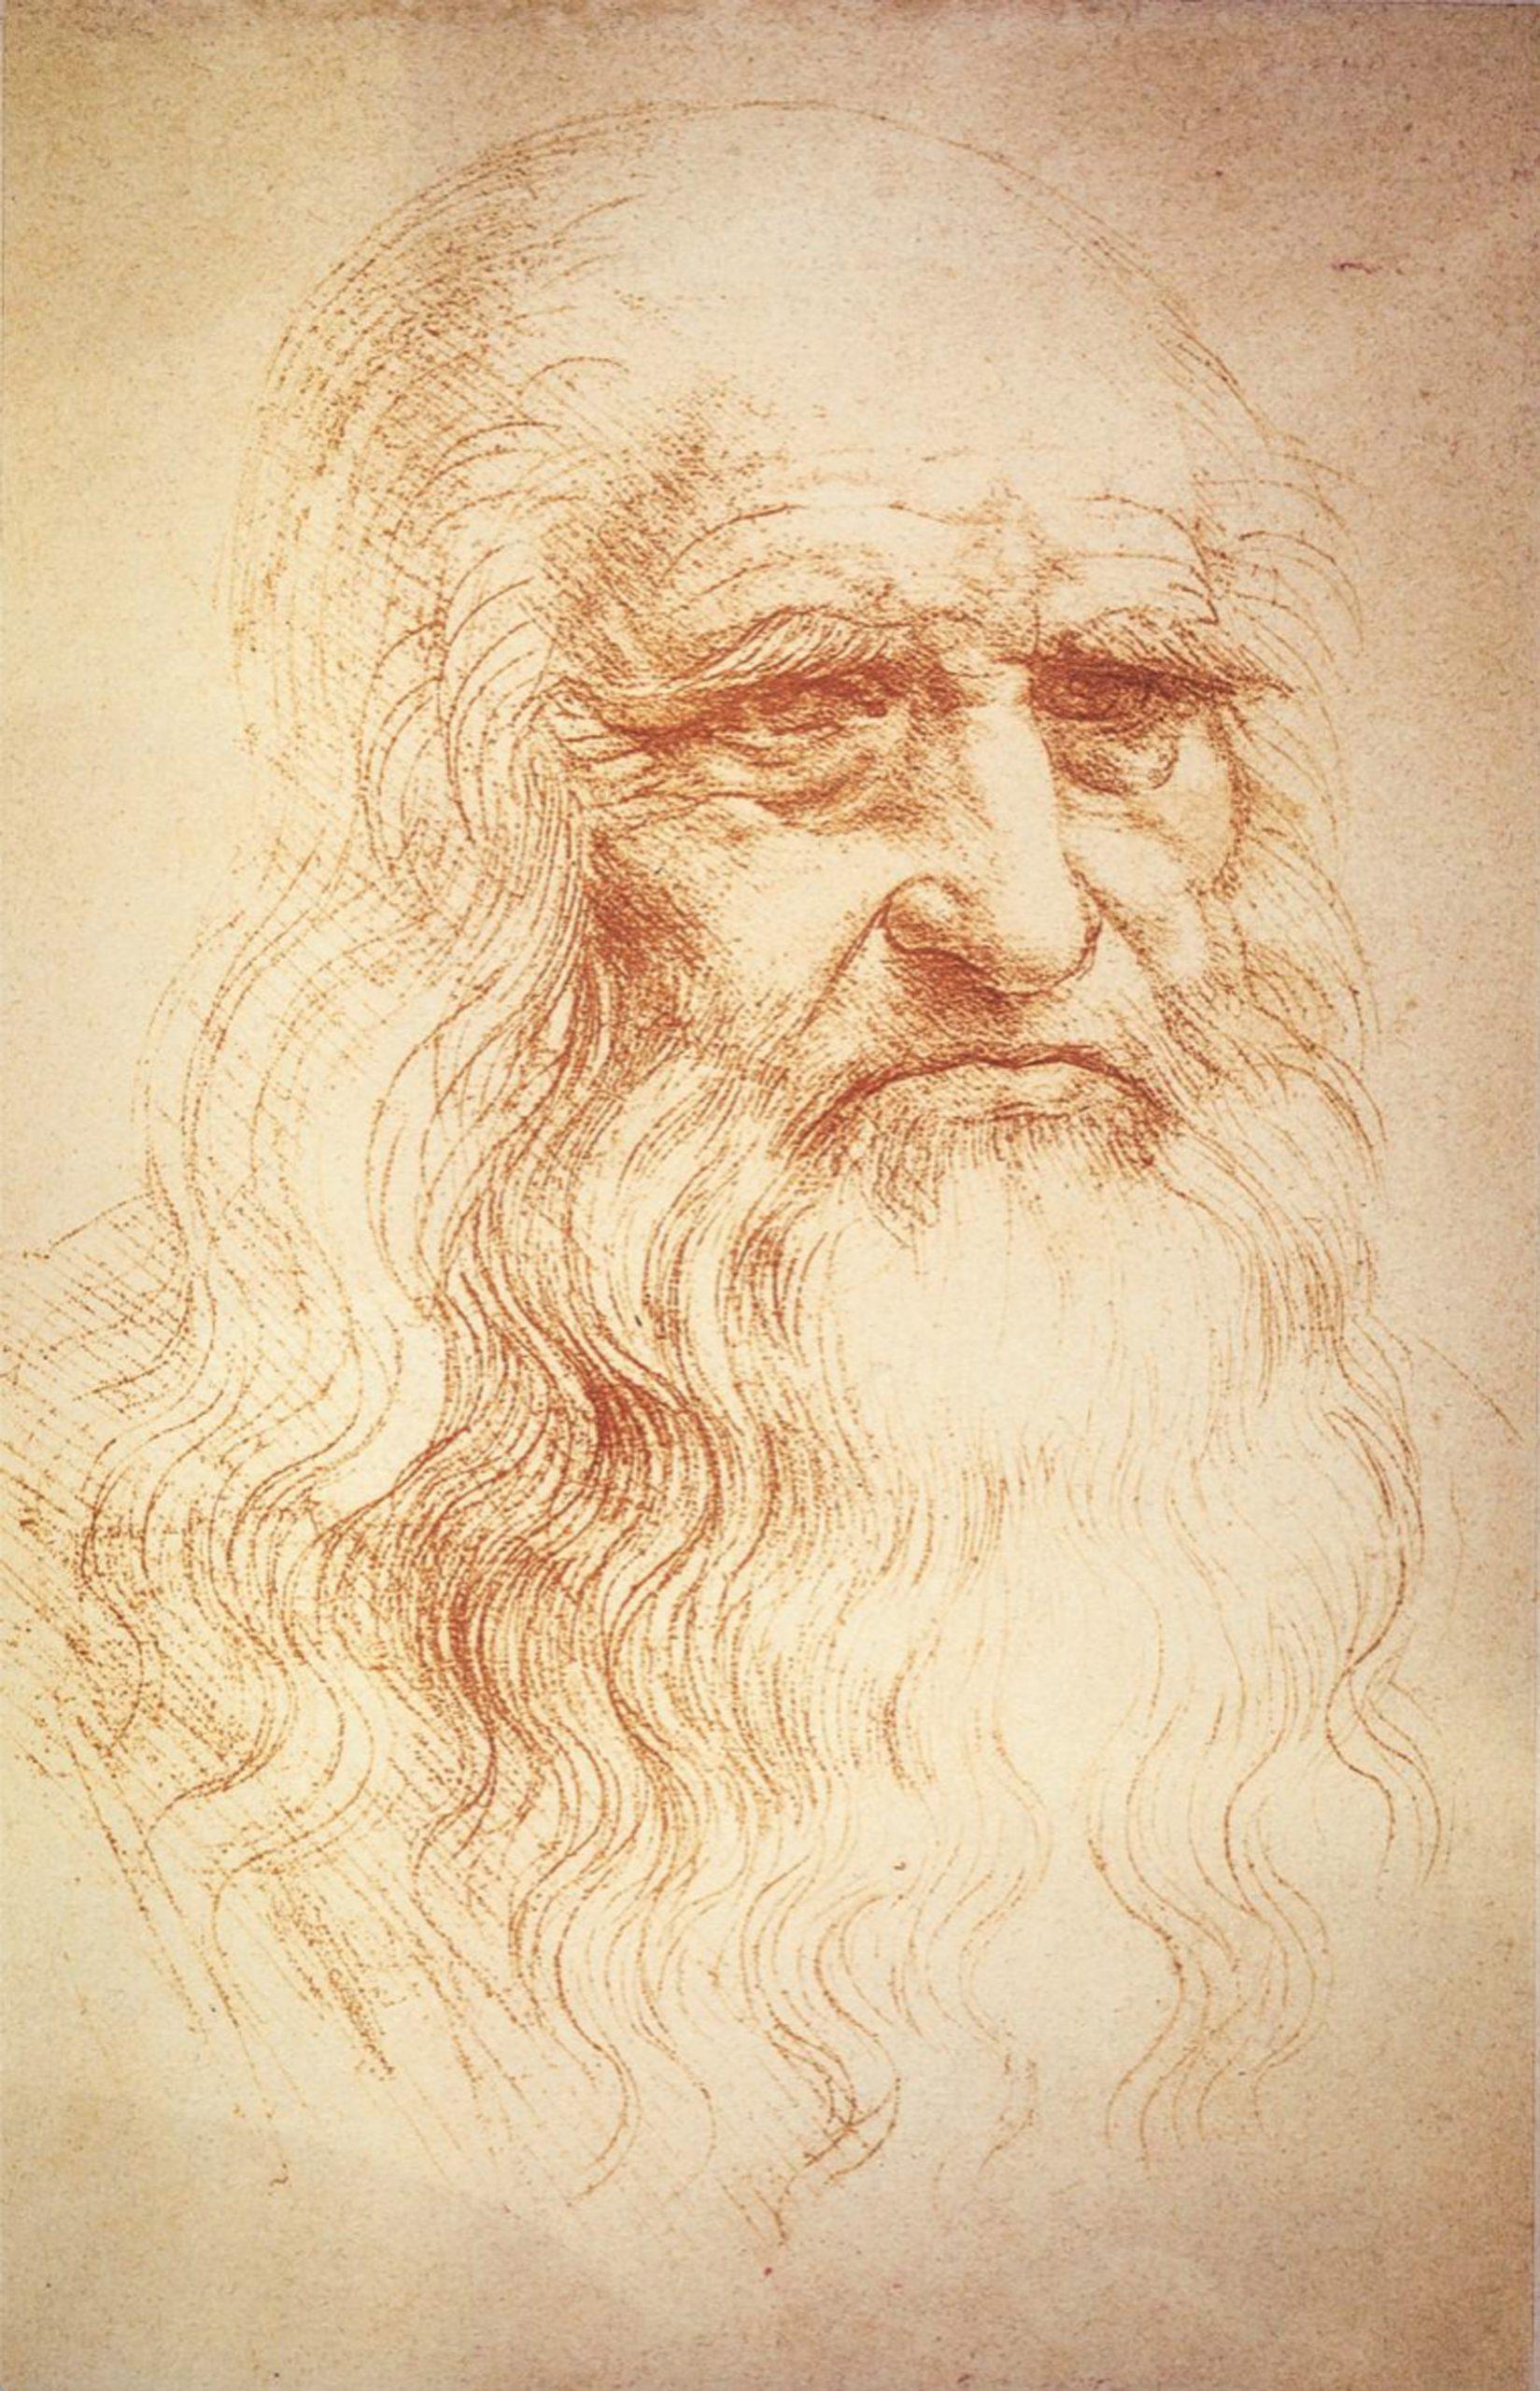 Zelfportret van Leonardo da Vinci